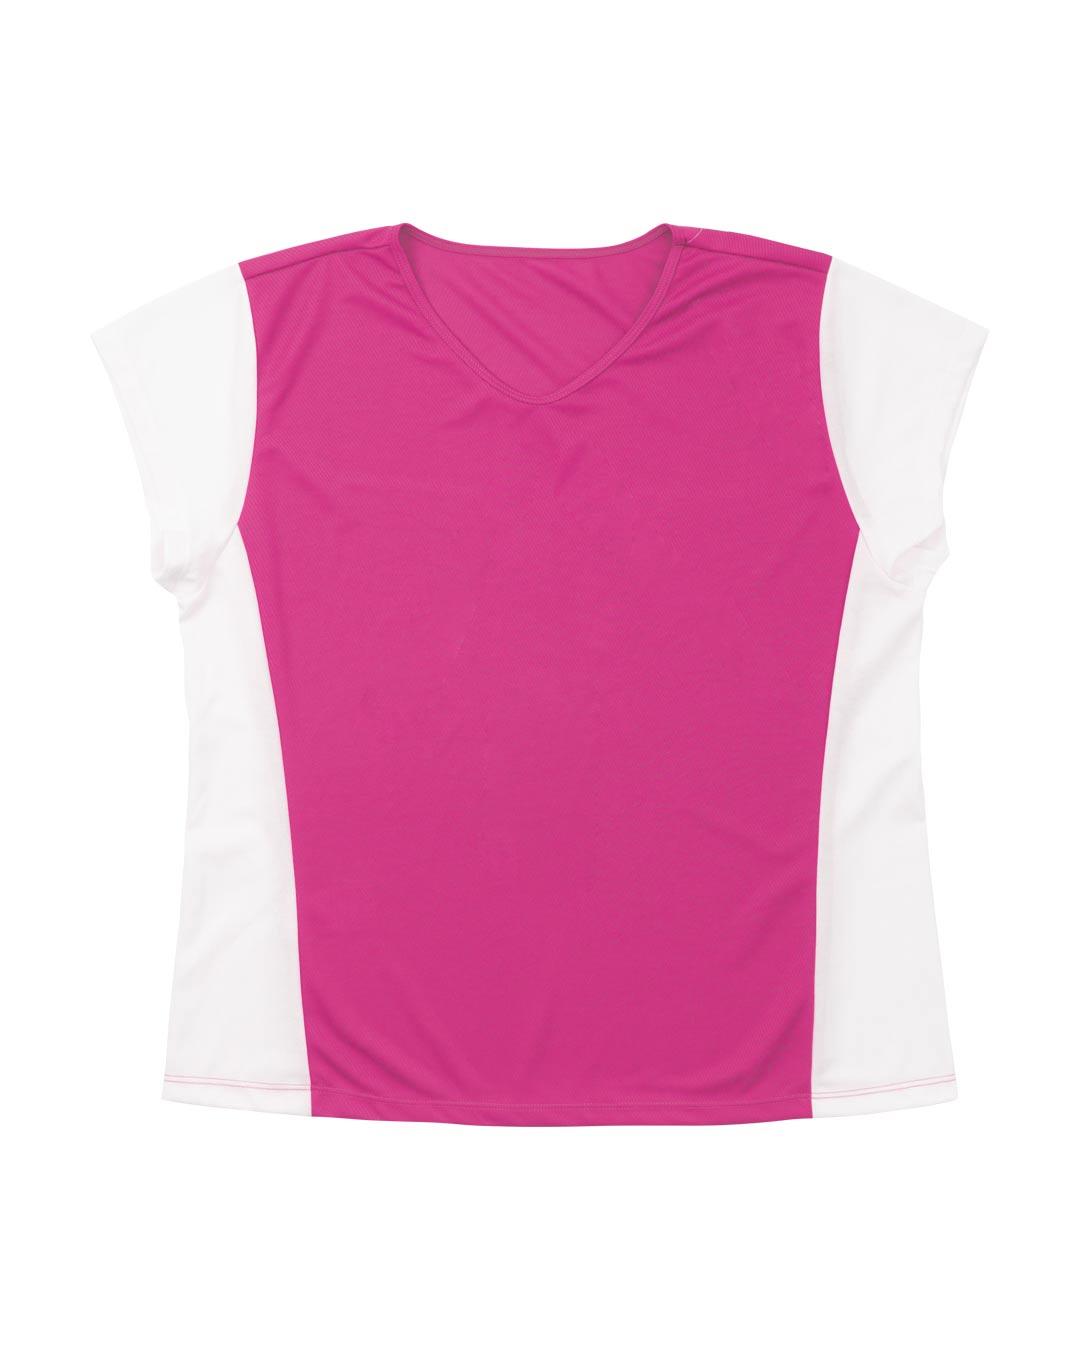 Blusa Plus Size Sport Dry Com Recorte Lateral Rosa Pink - Movimente-se